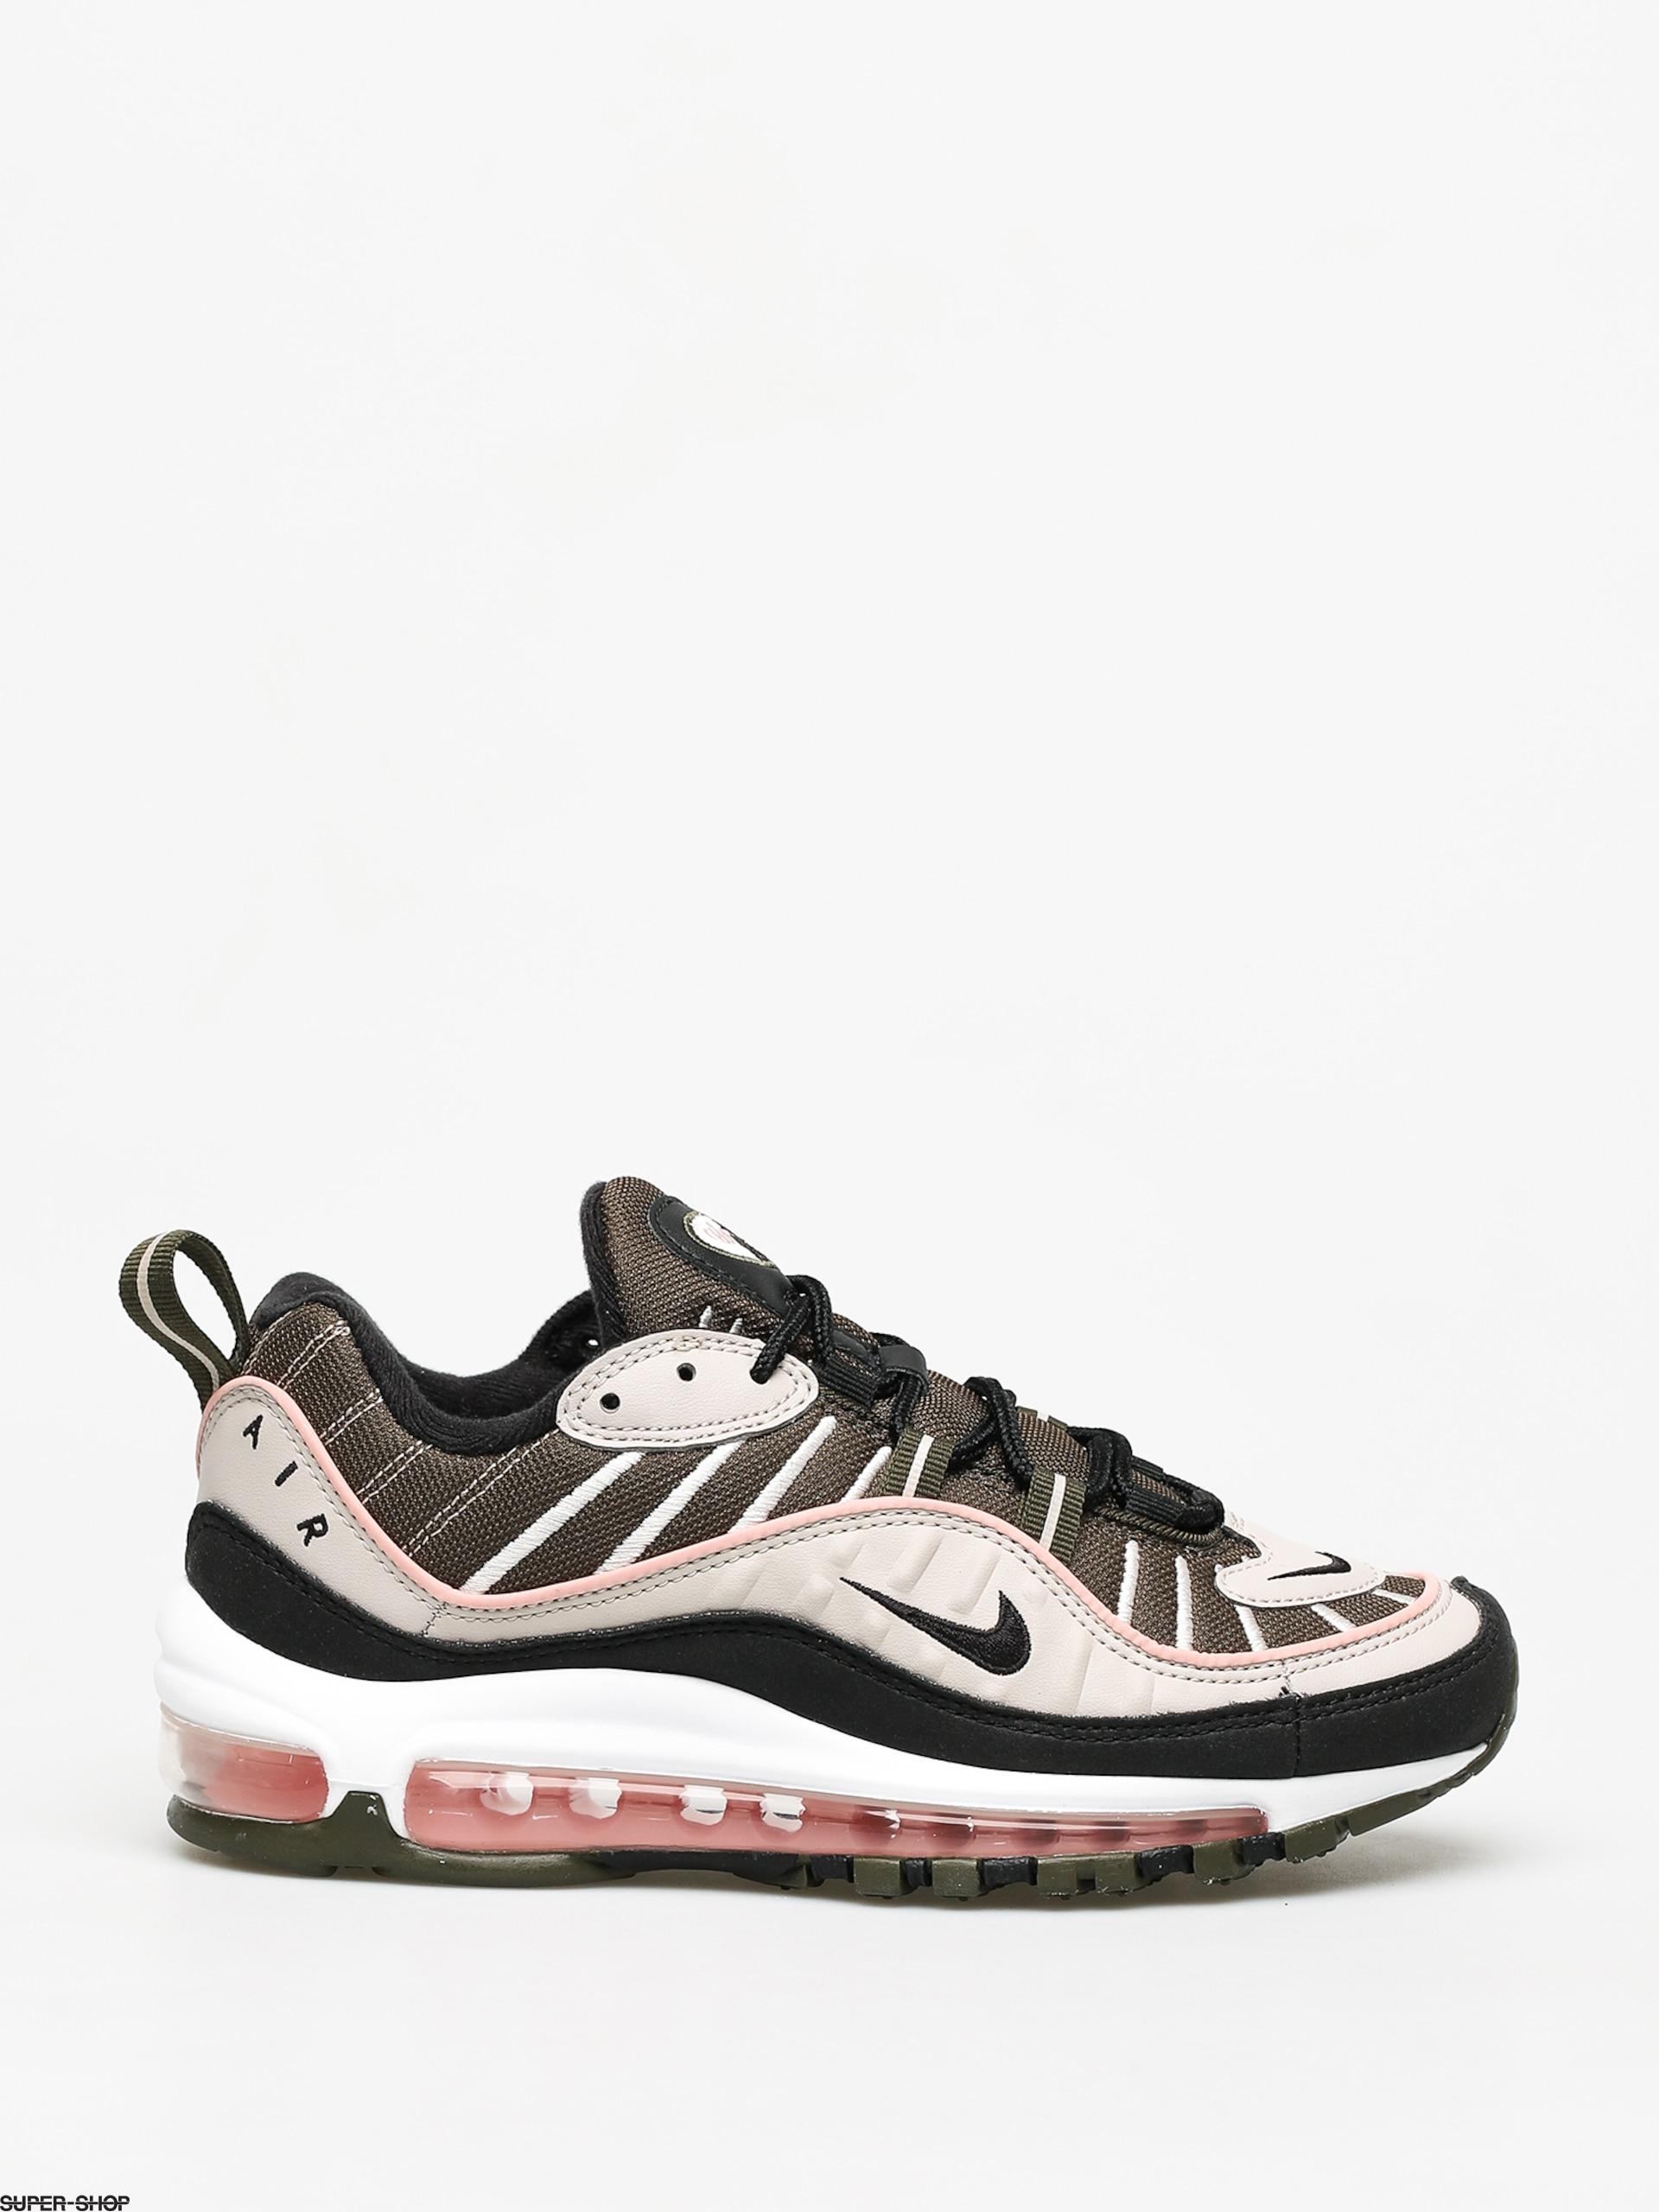 melocotón ligado sueño  Nike Air Max 98 Shoes Wmn (cargo khaki/black desert sand)